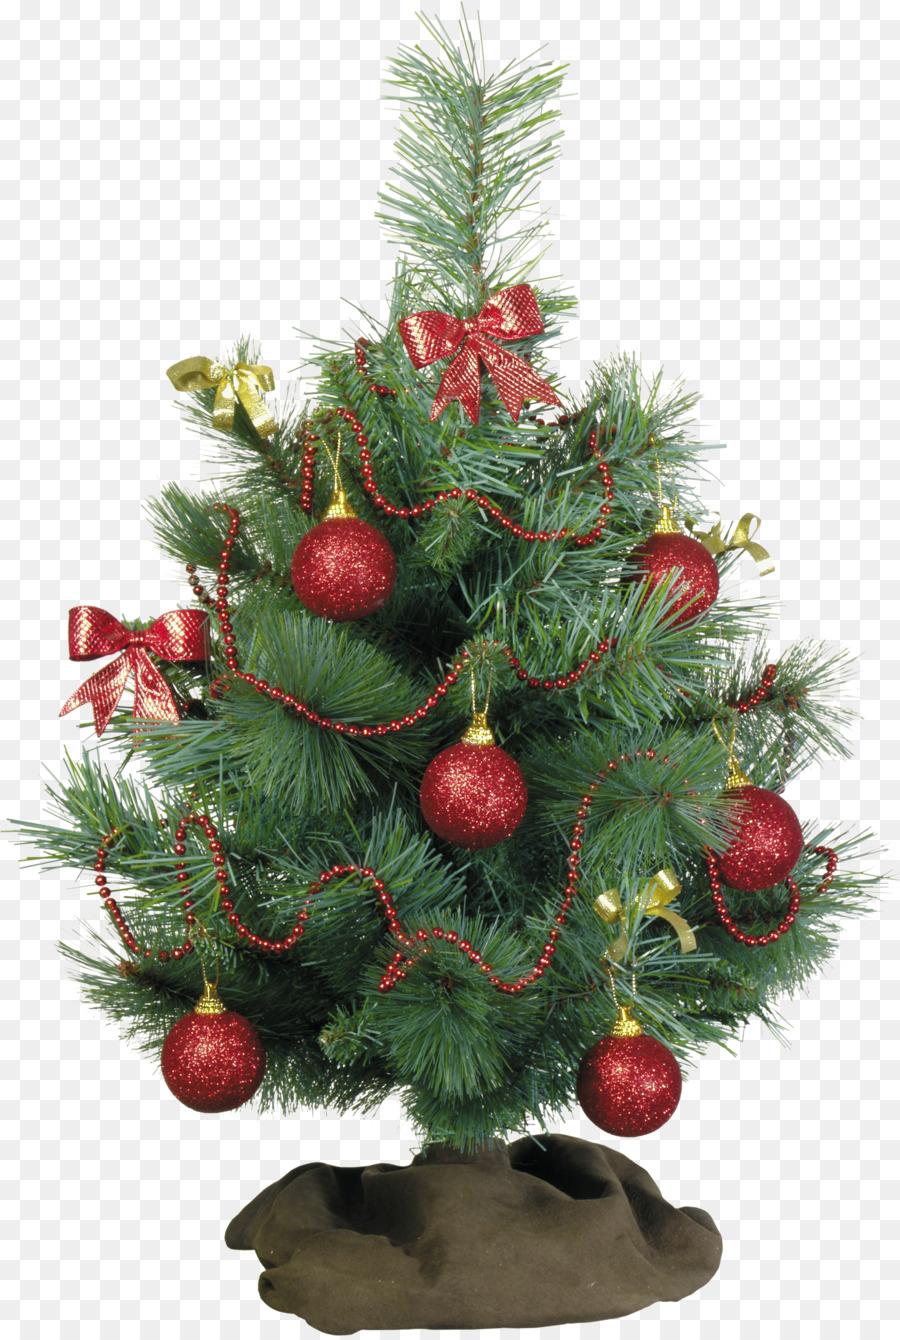 YouTube Actor Photography Christmas Art - christmas tree png ...